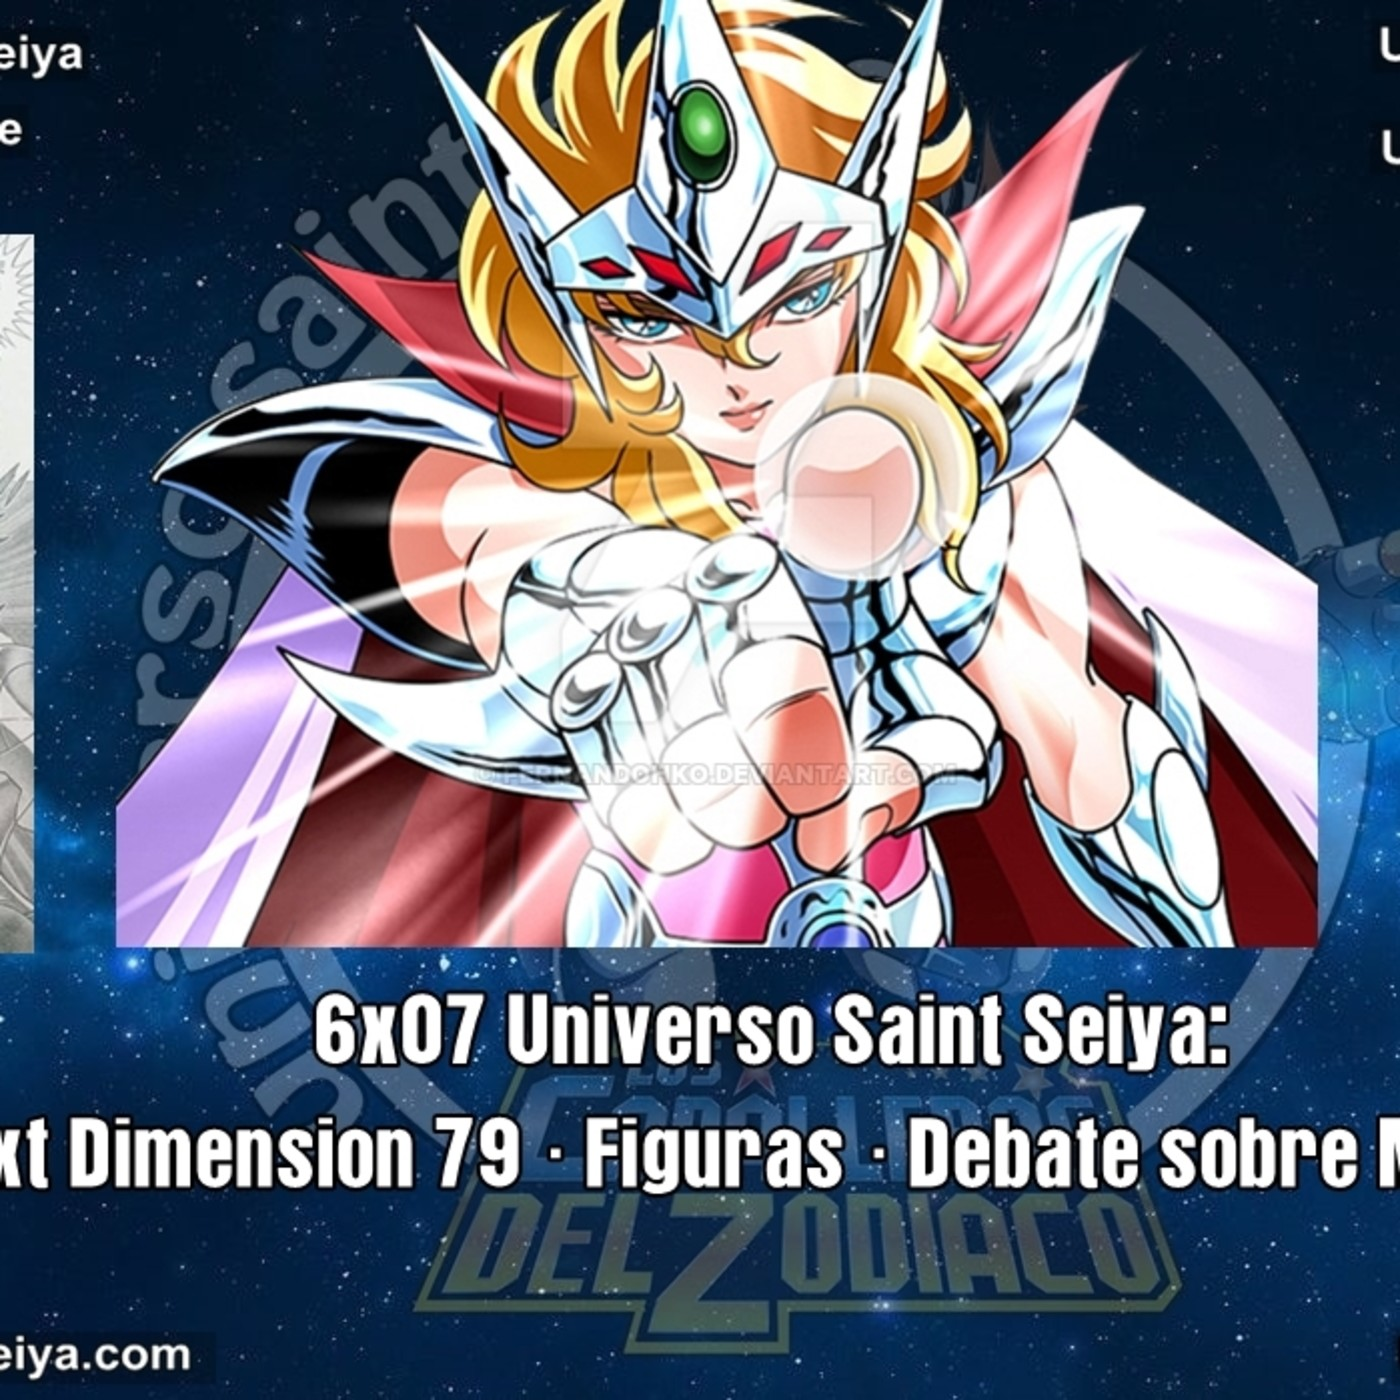 6x07 Universo Saint Seiya: Noticias · Next Dimension 79